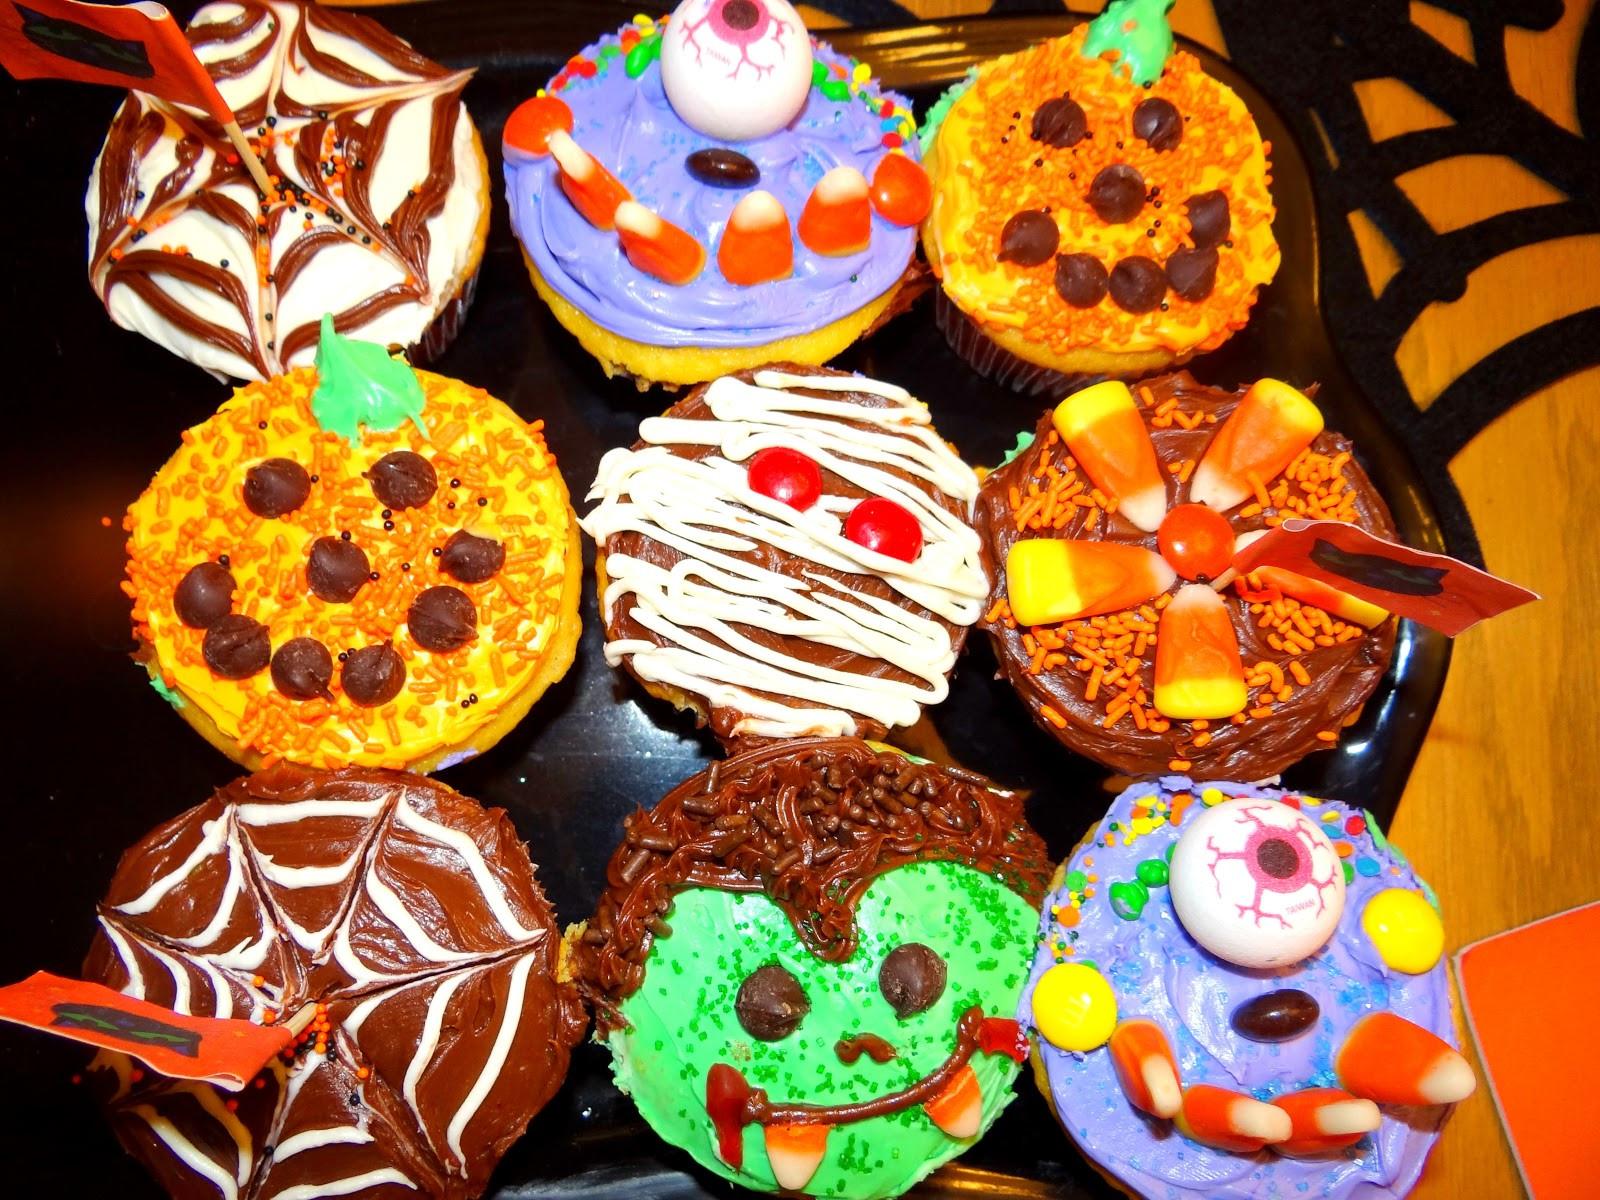 Cute Halloween Cupcakes  Pattie s Place Halloween Cupcakes and Skeleton Brownies